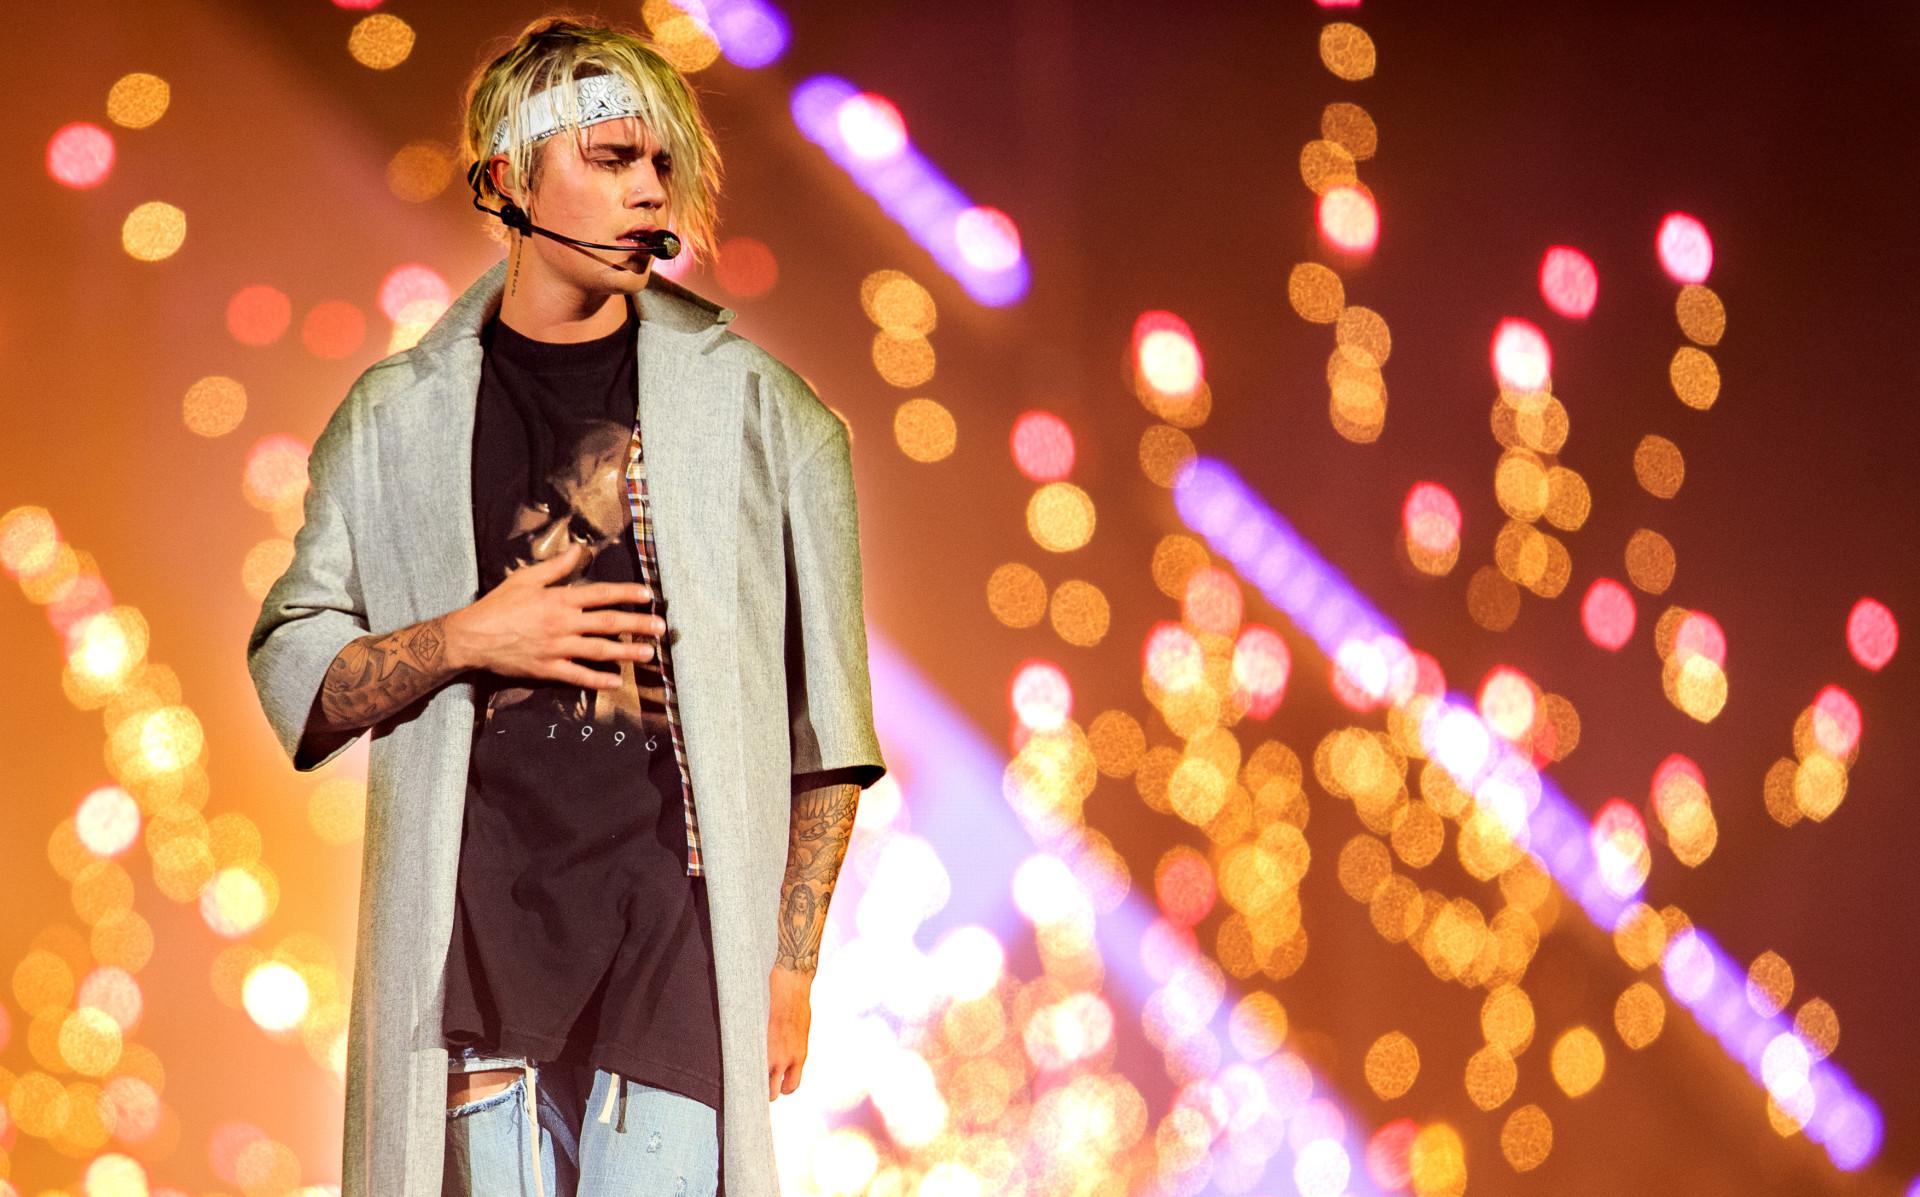 Billboard Music Awards: veja a lista completa dos indicados